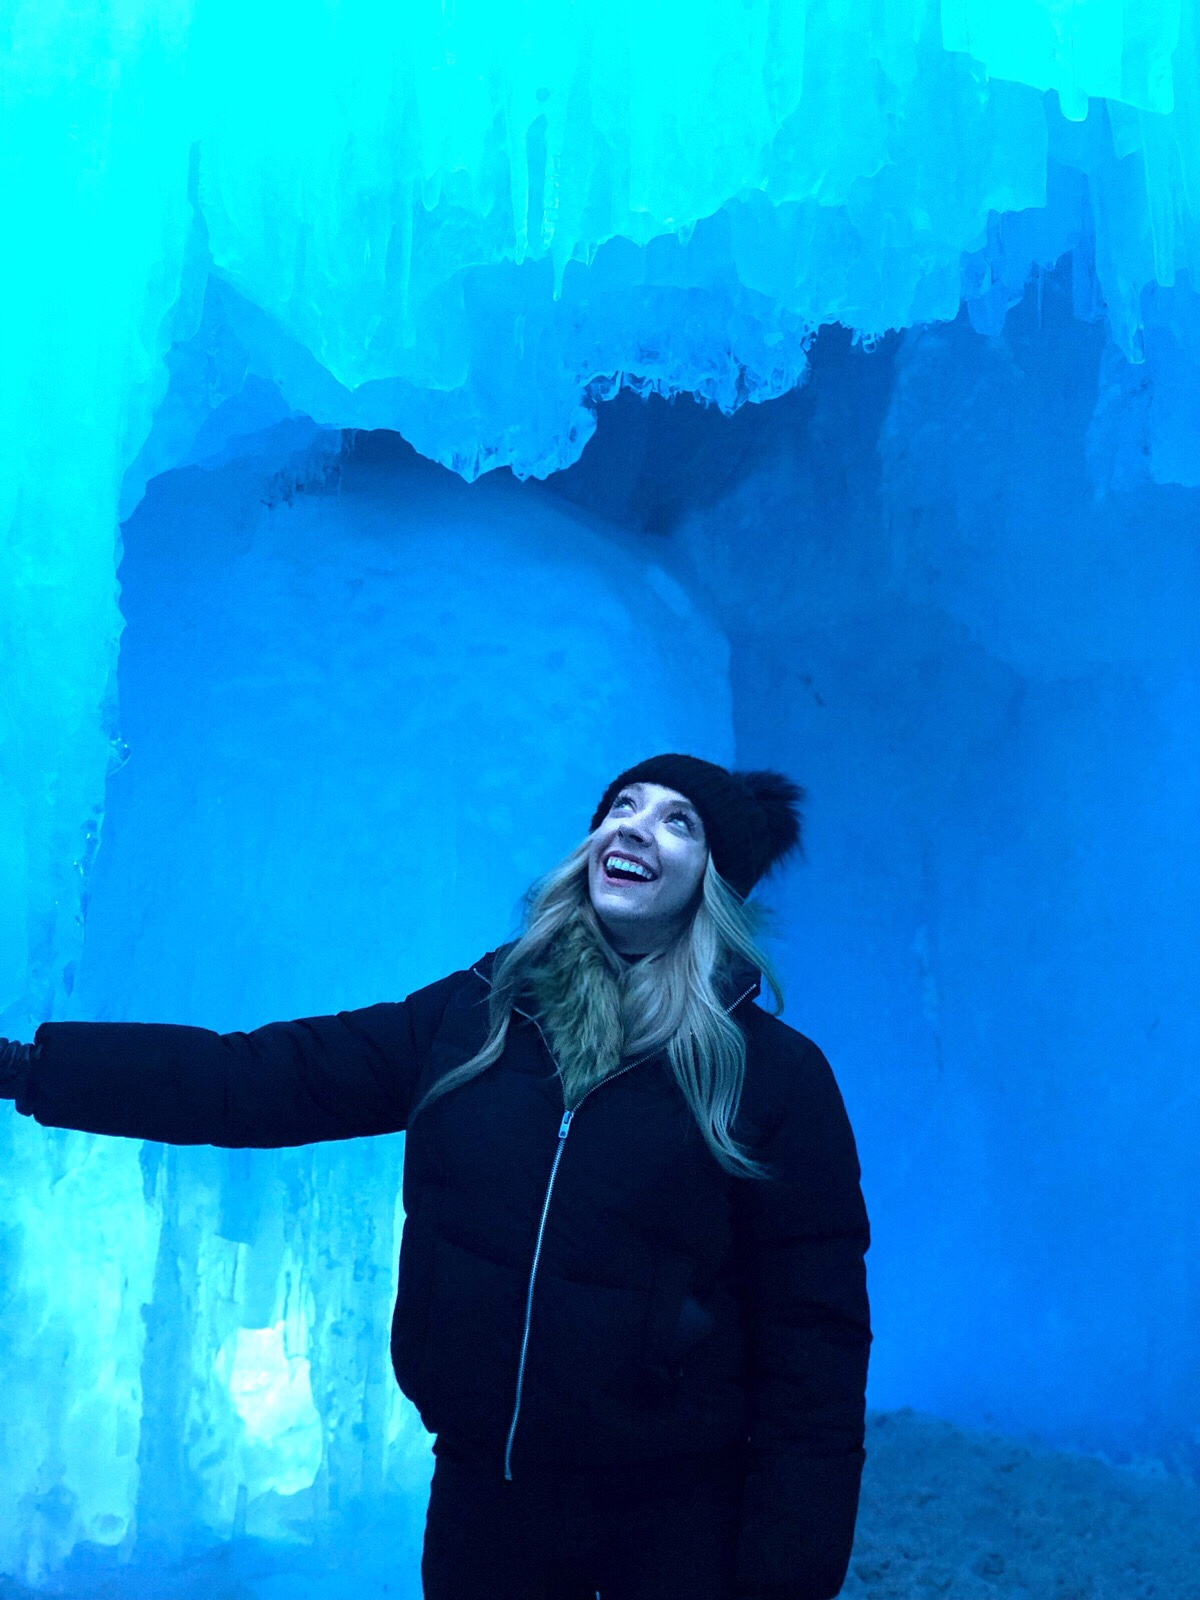 Dillon Ice Castle